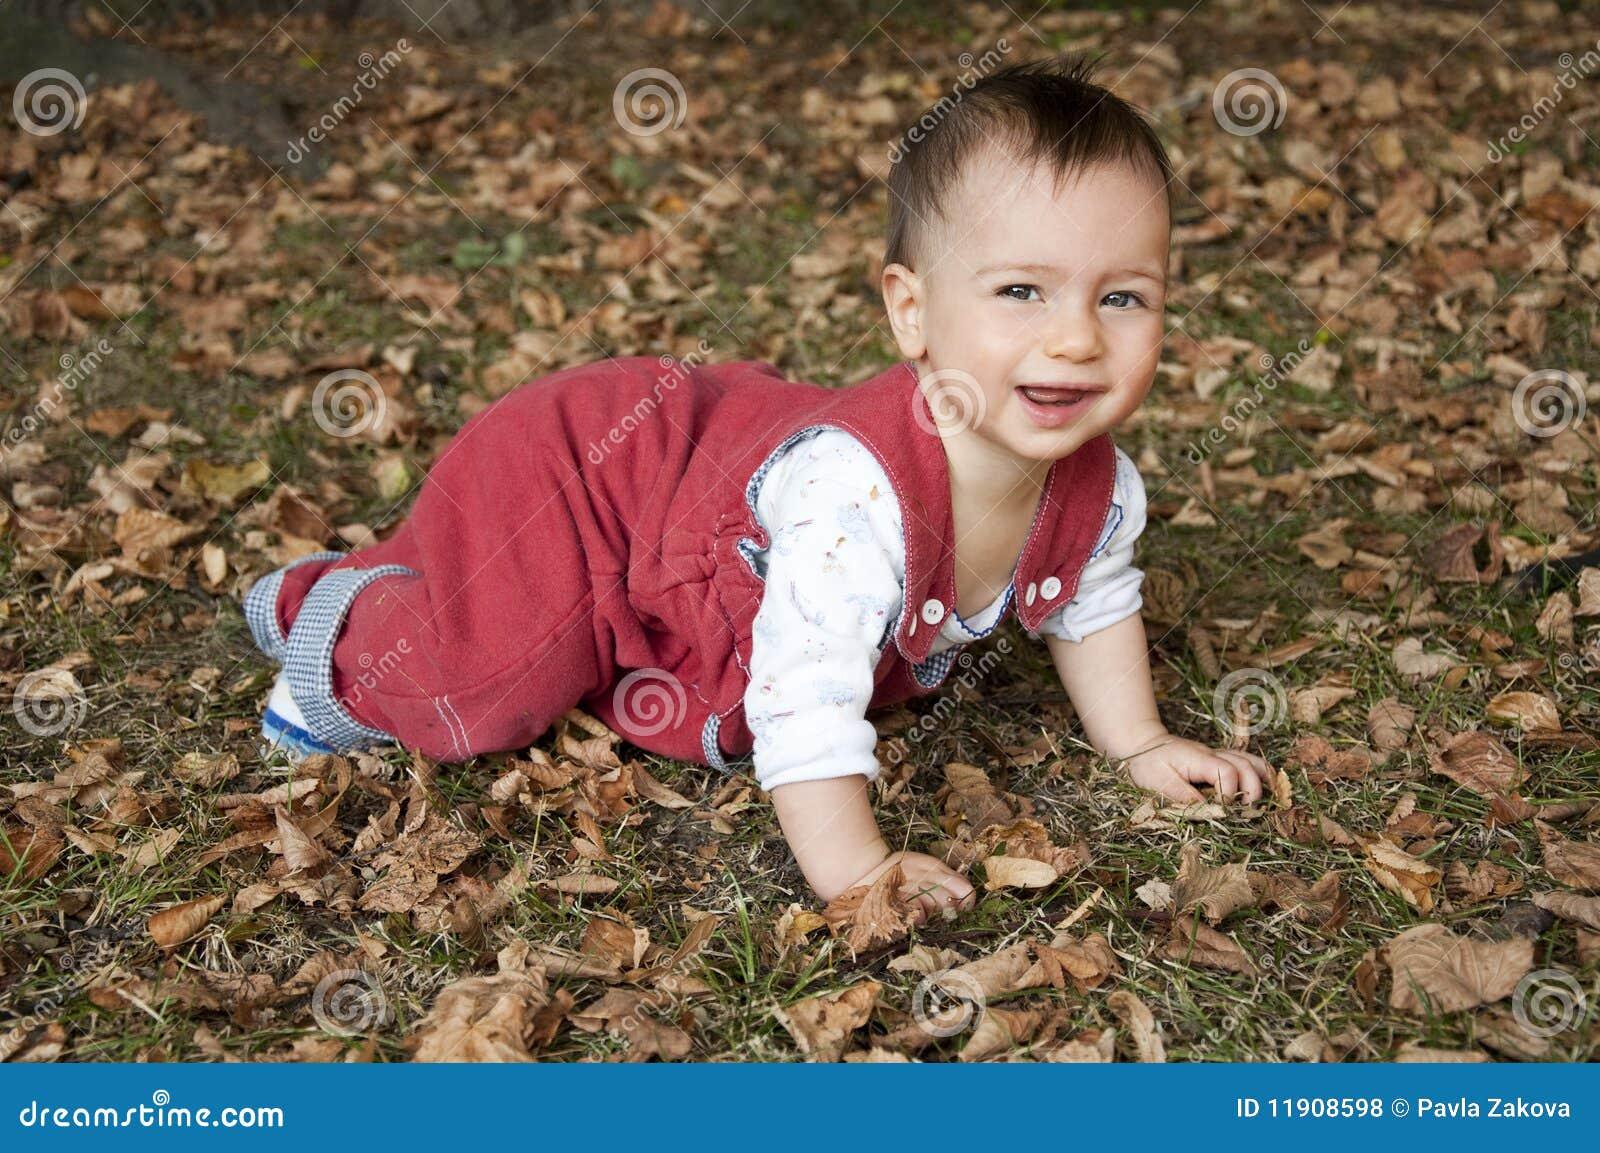 Baby Exploring Royalty Free Stock Photos Image 11908598